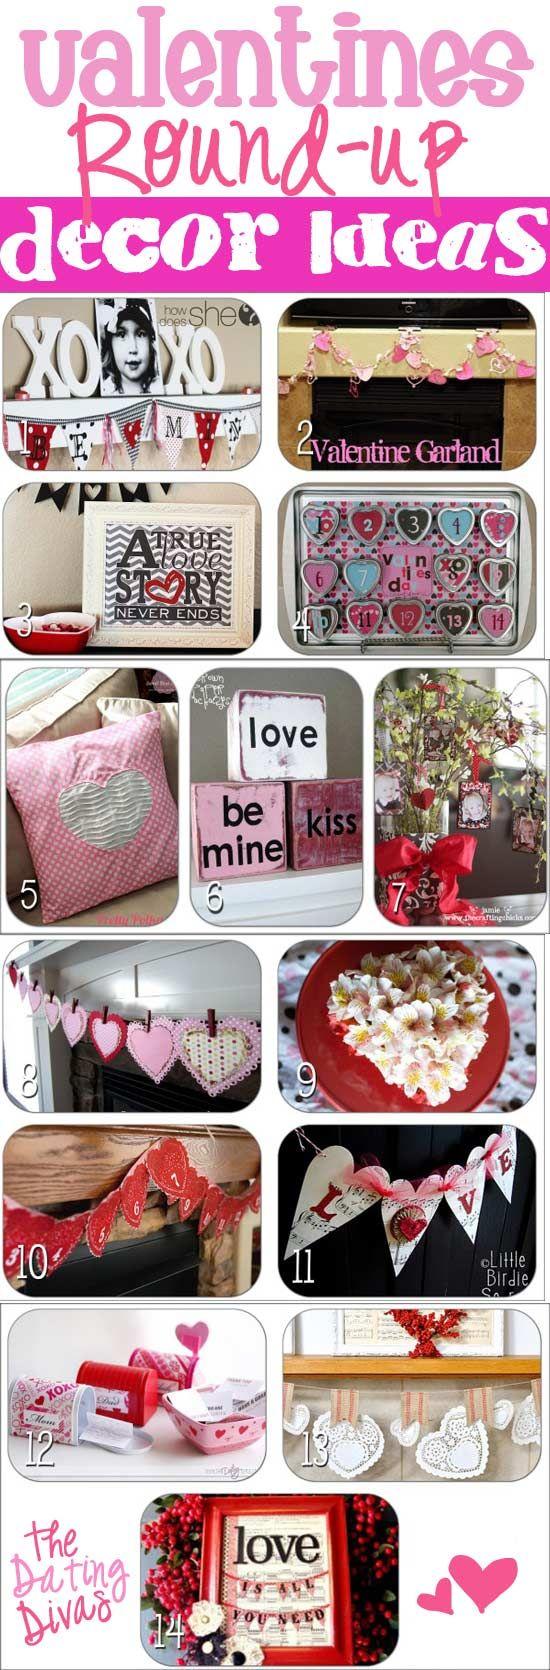 14 Fabulous Decor Ideas for V-day. #vday  #valentines #datingdivas